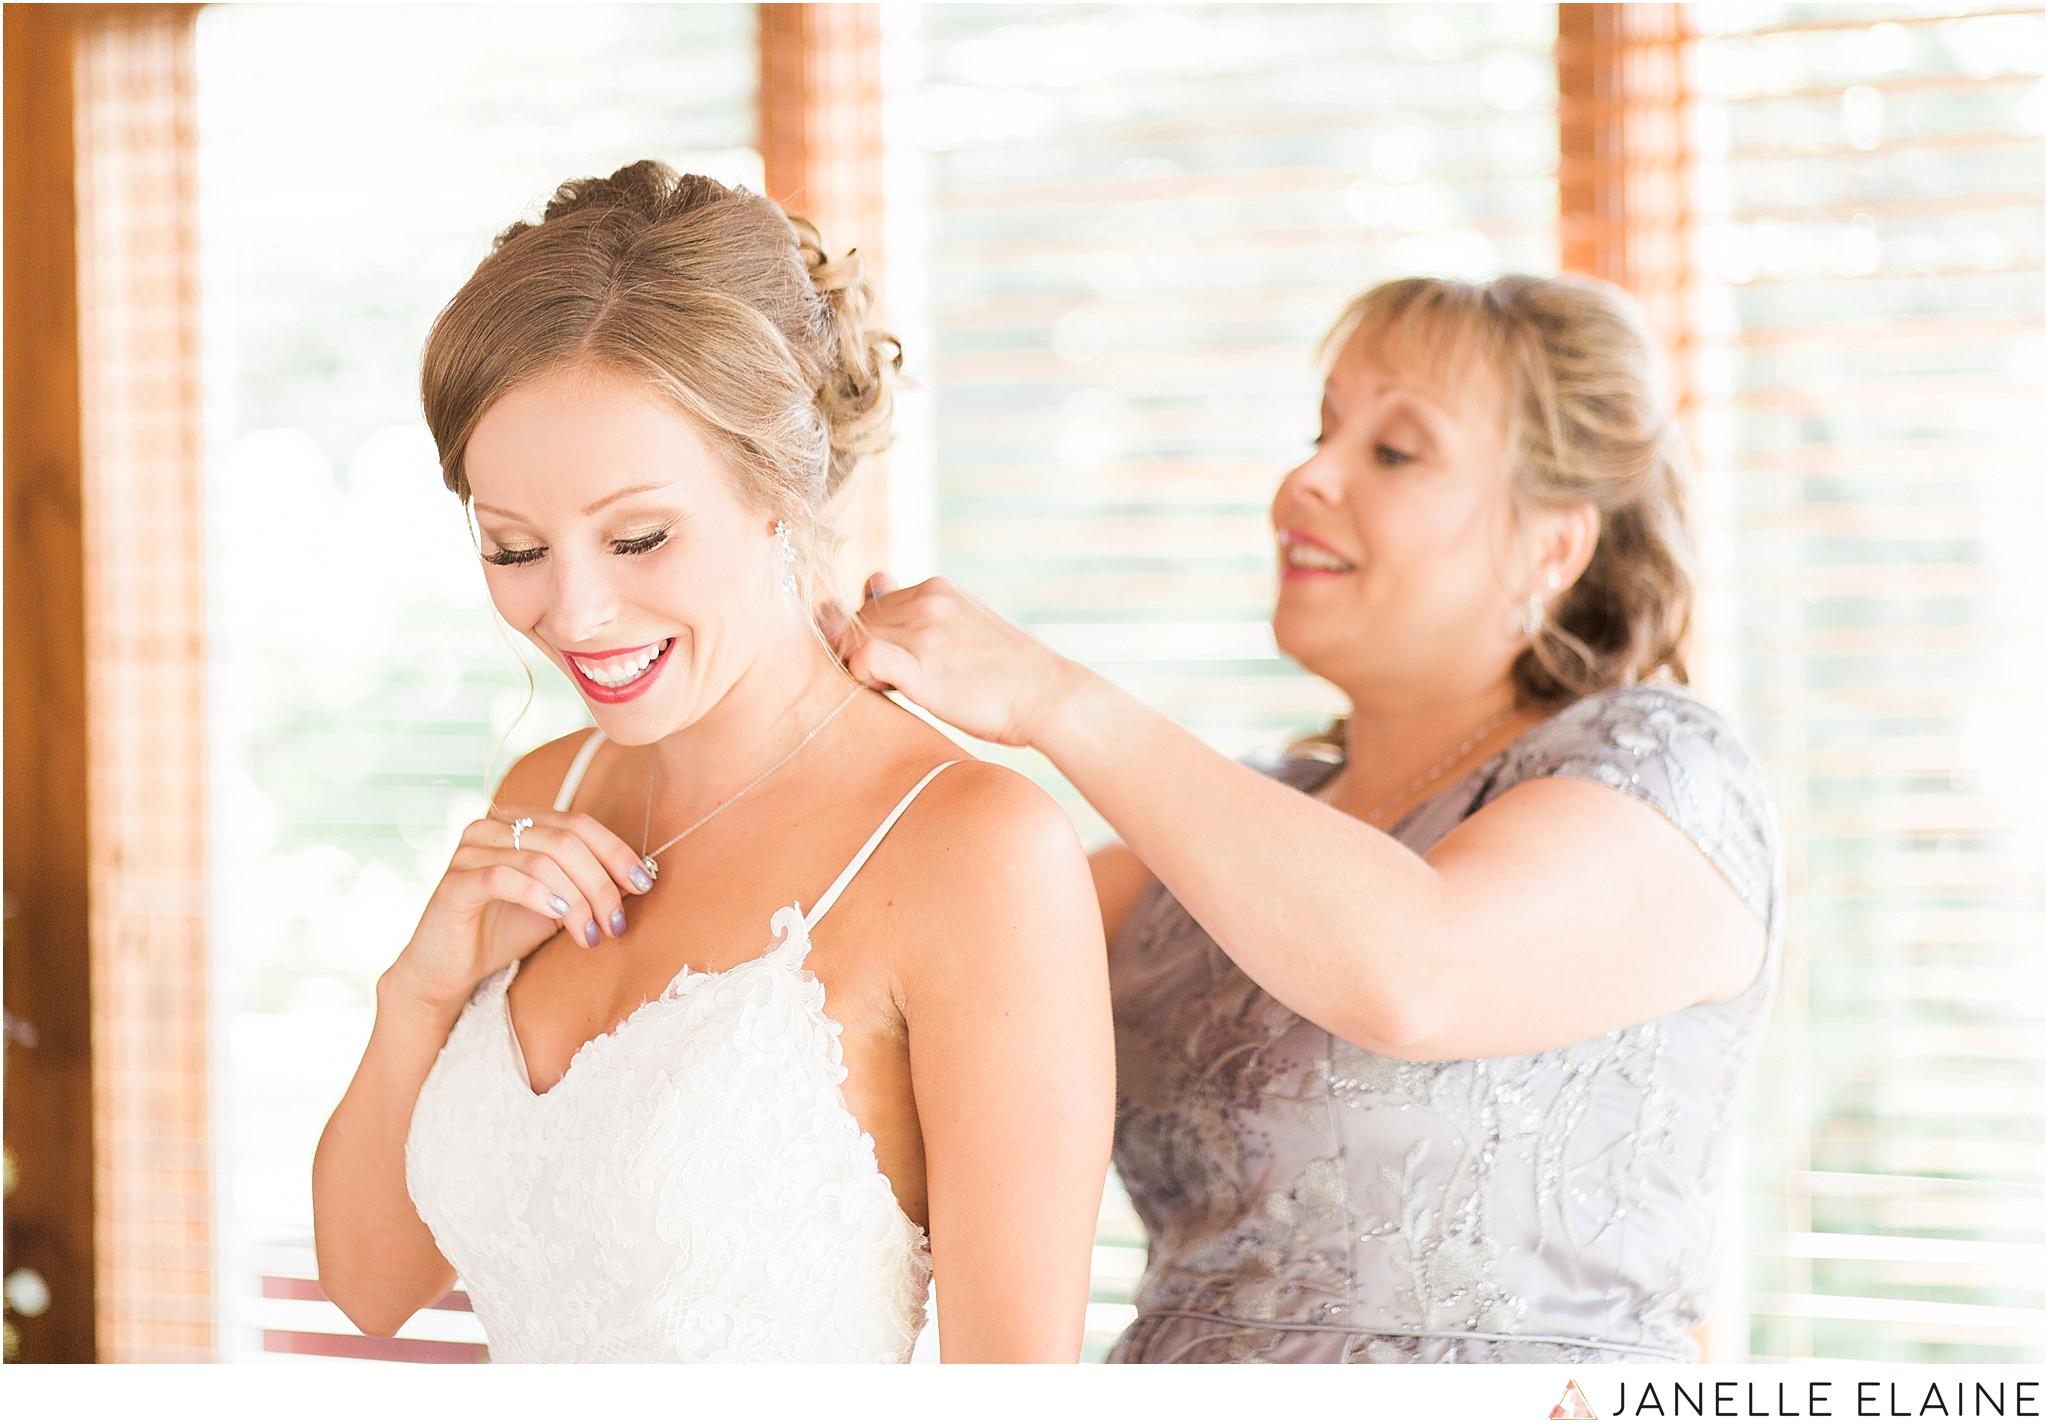 warnsholz-wedding-michigan-photography-janelle elaine photography-30.jpg